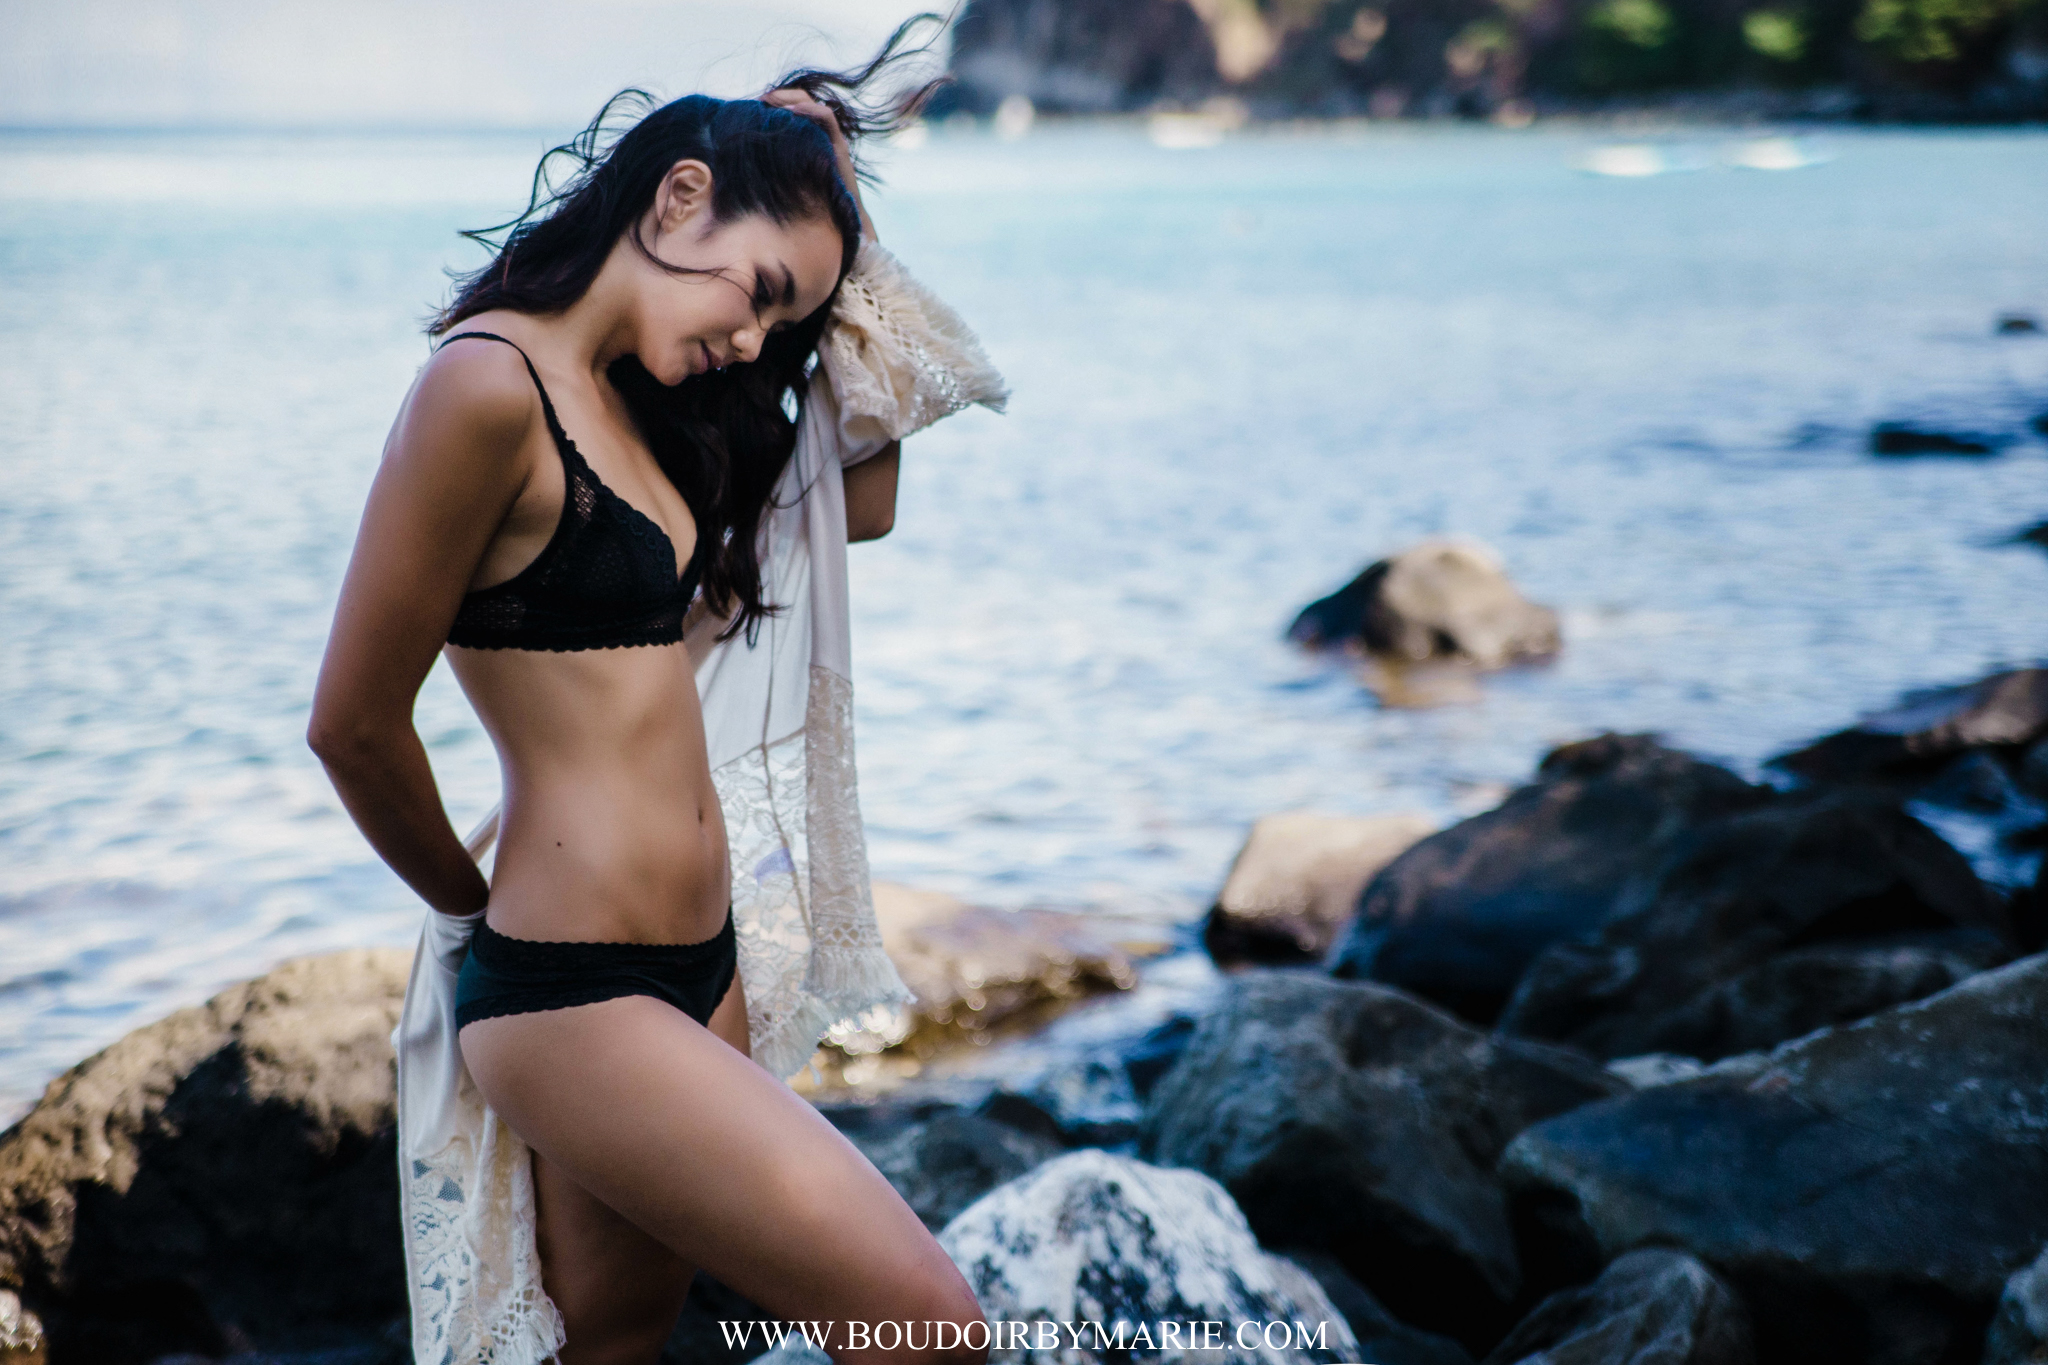 BoudoirbyMarie-MauiHawaiiBoudoir-14.jpg